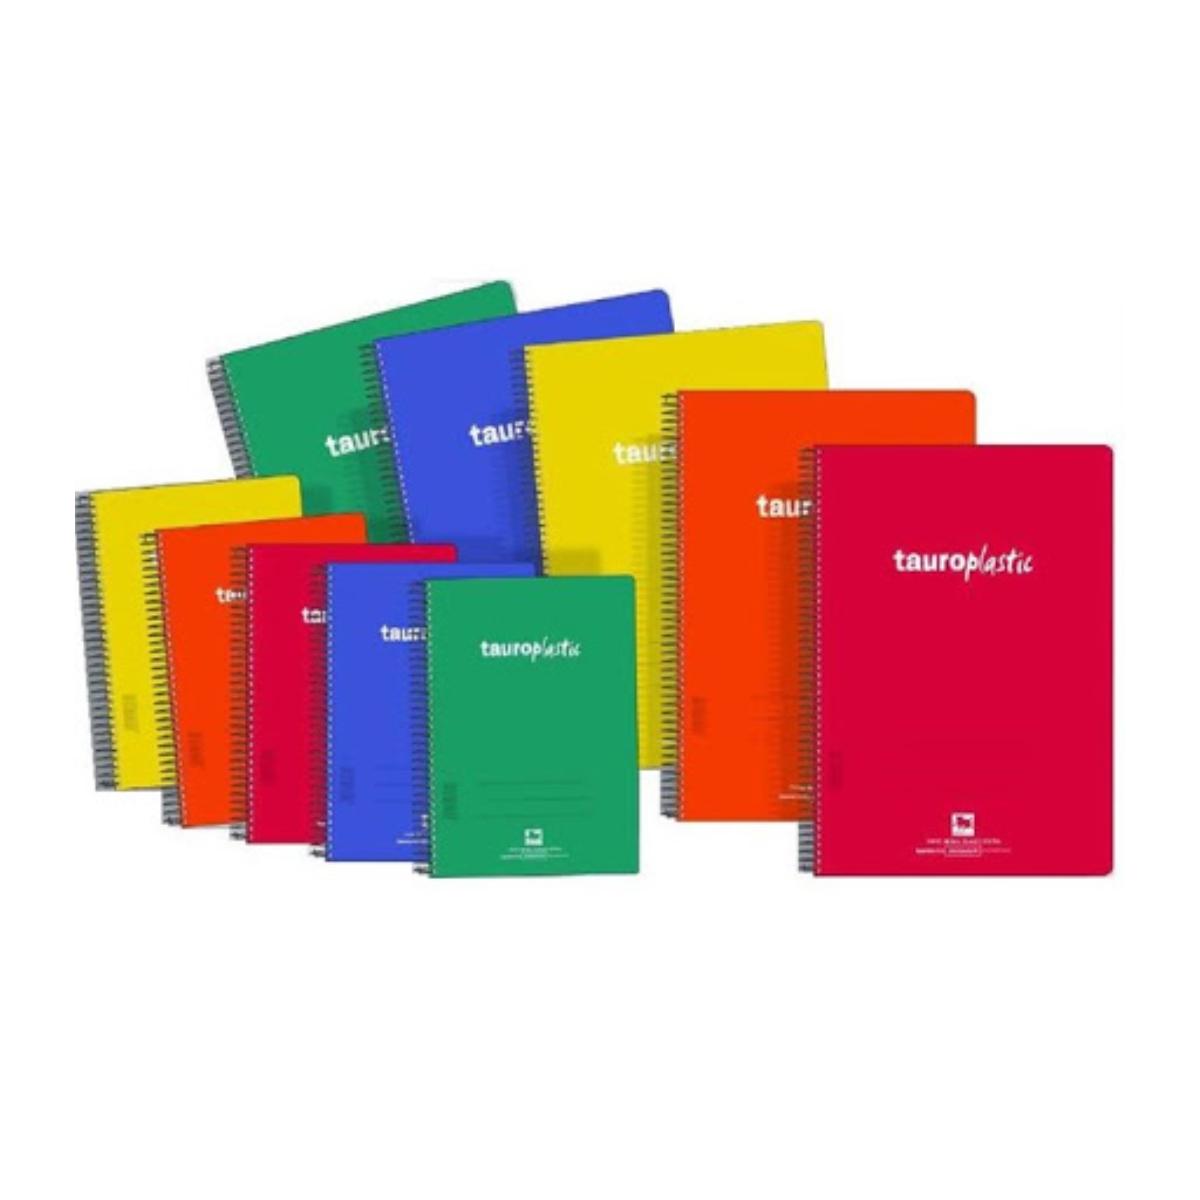 Folio 80H Tapa Plástico Pack x8 Cuadernos Espiral TAURO Plastic